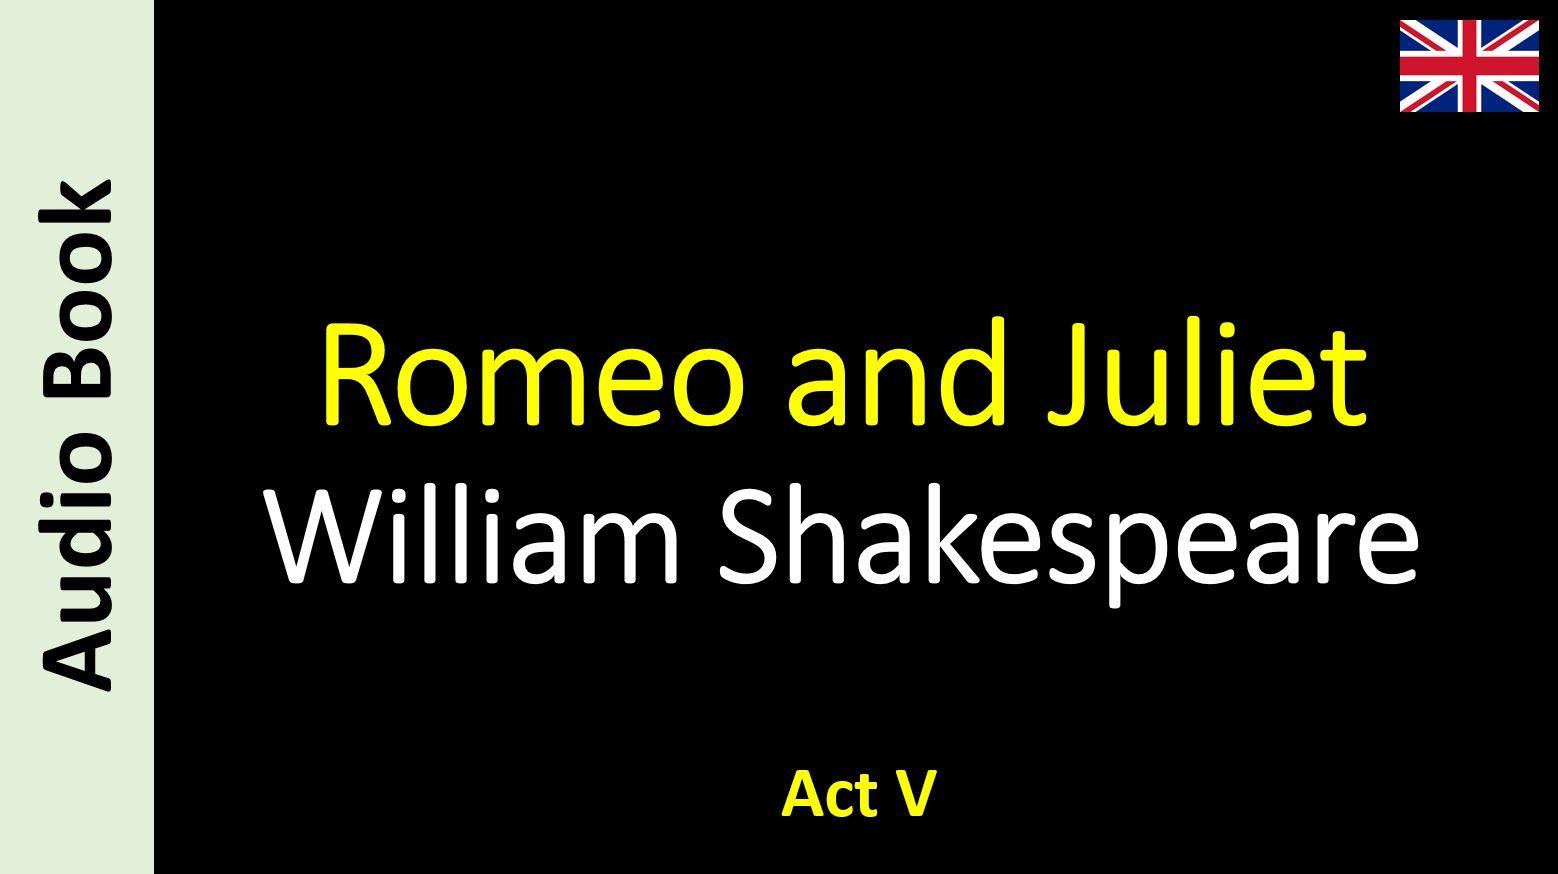 William Shakespeare - Romeo and Juliet - 05 / 05